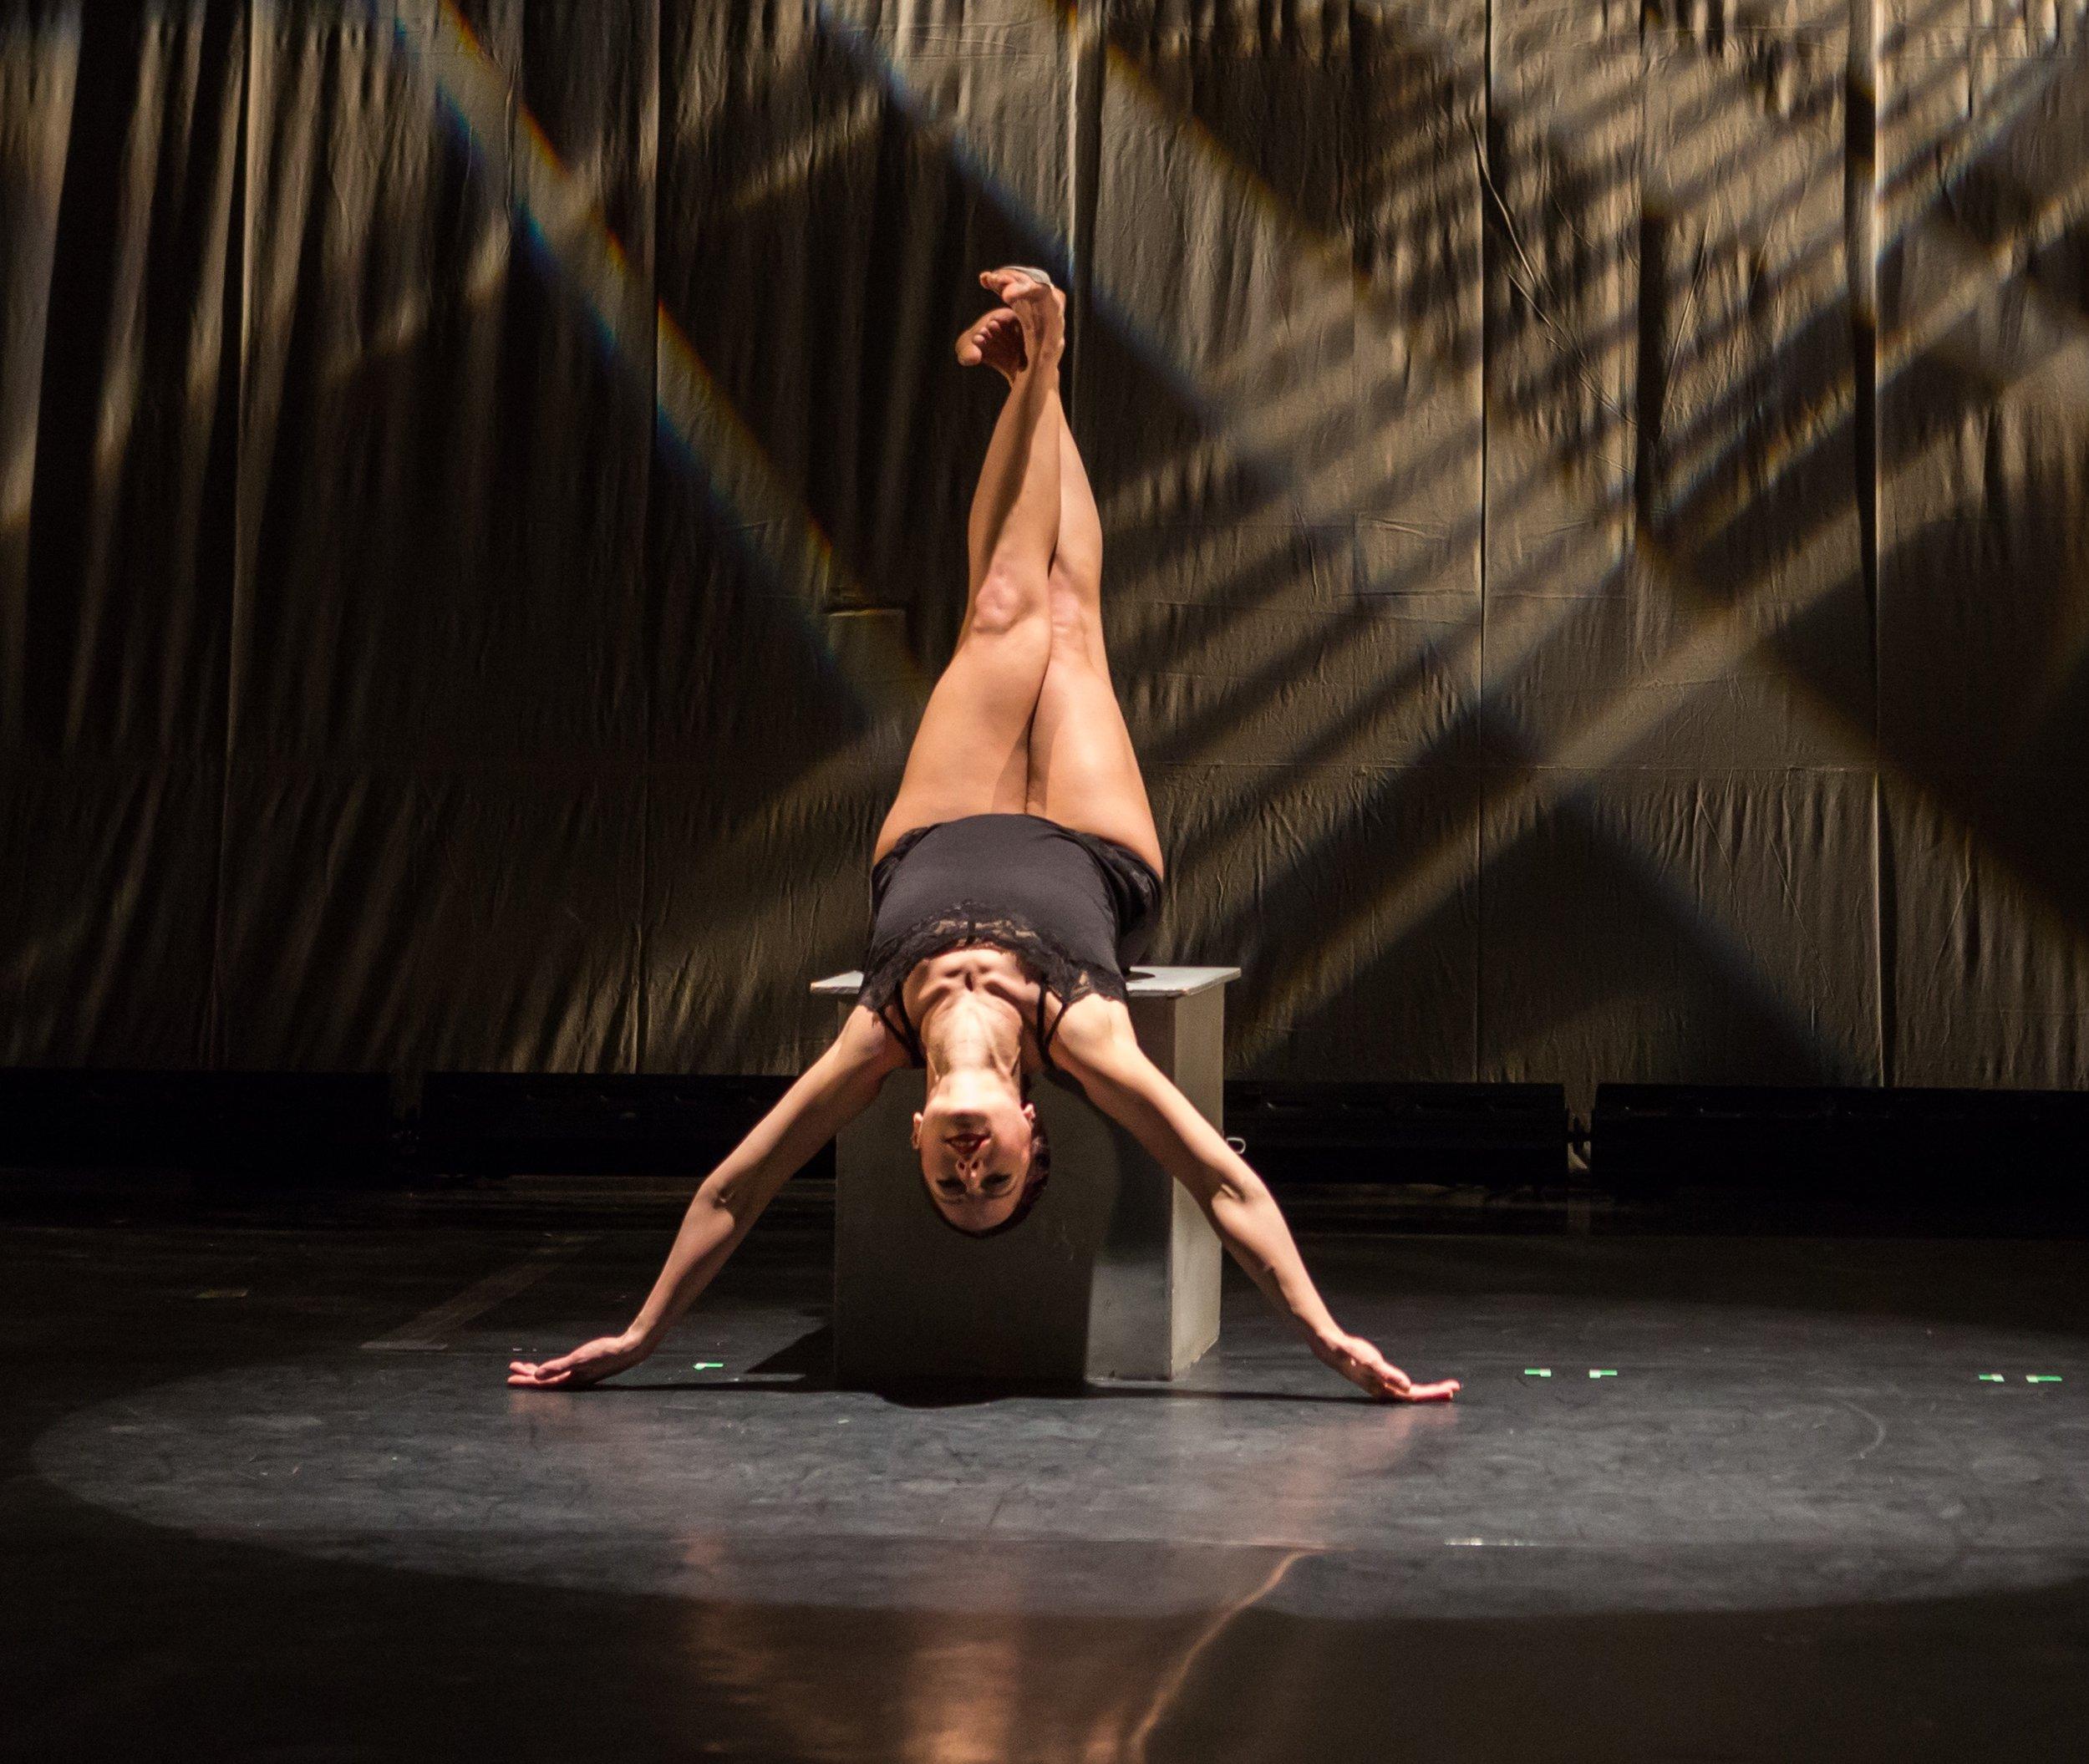 Tracie Stanfield is '...an innovative voice in the expanding form of jazz dance...' - www.JazzDanceEnews.com